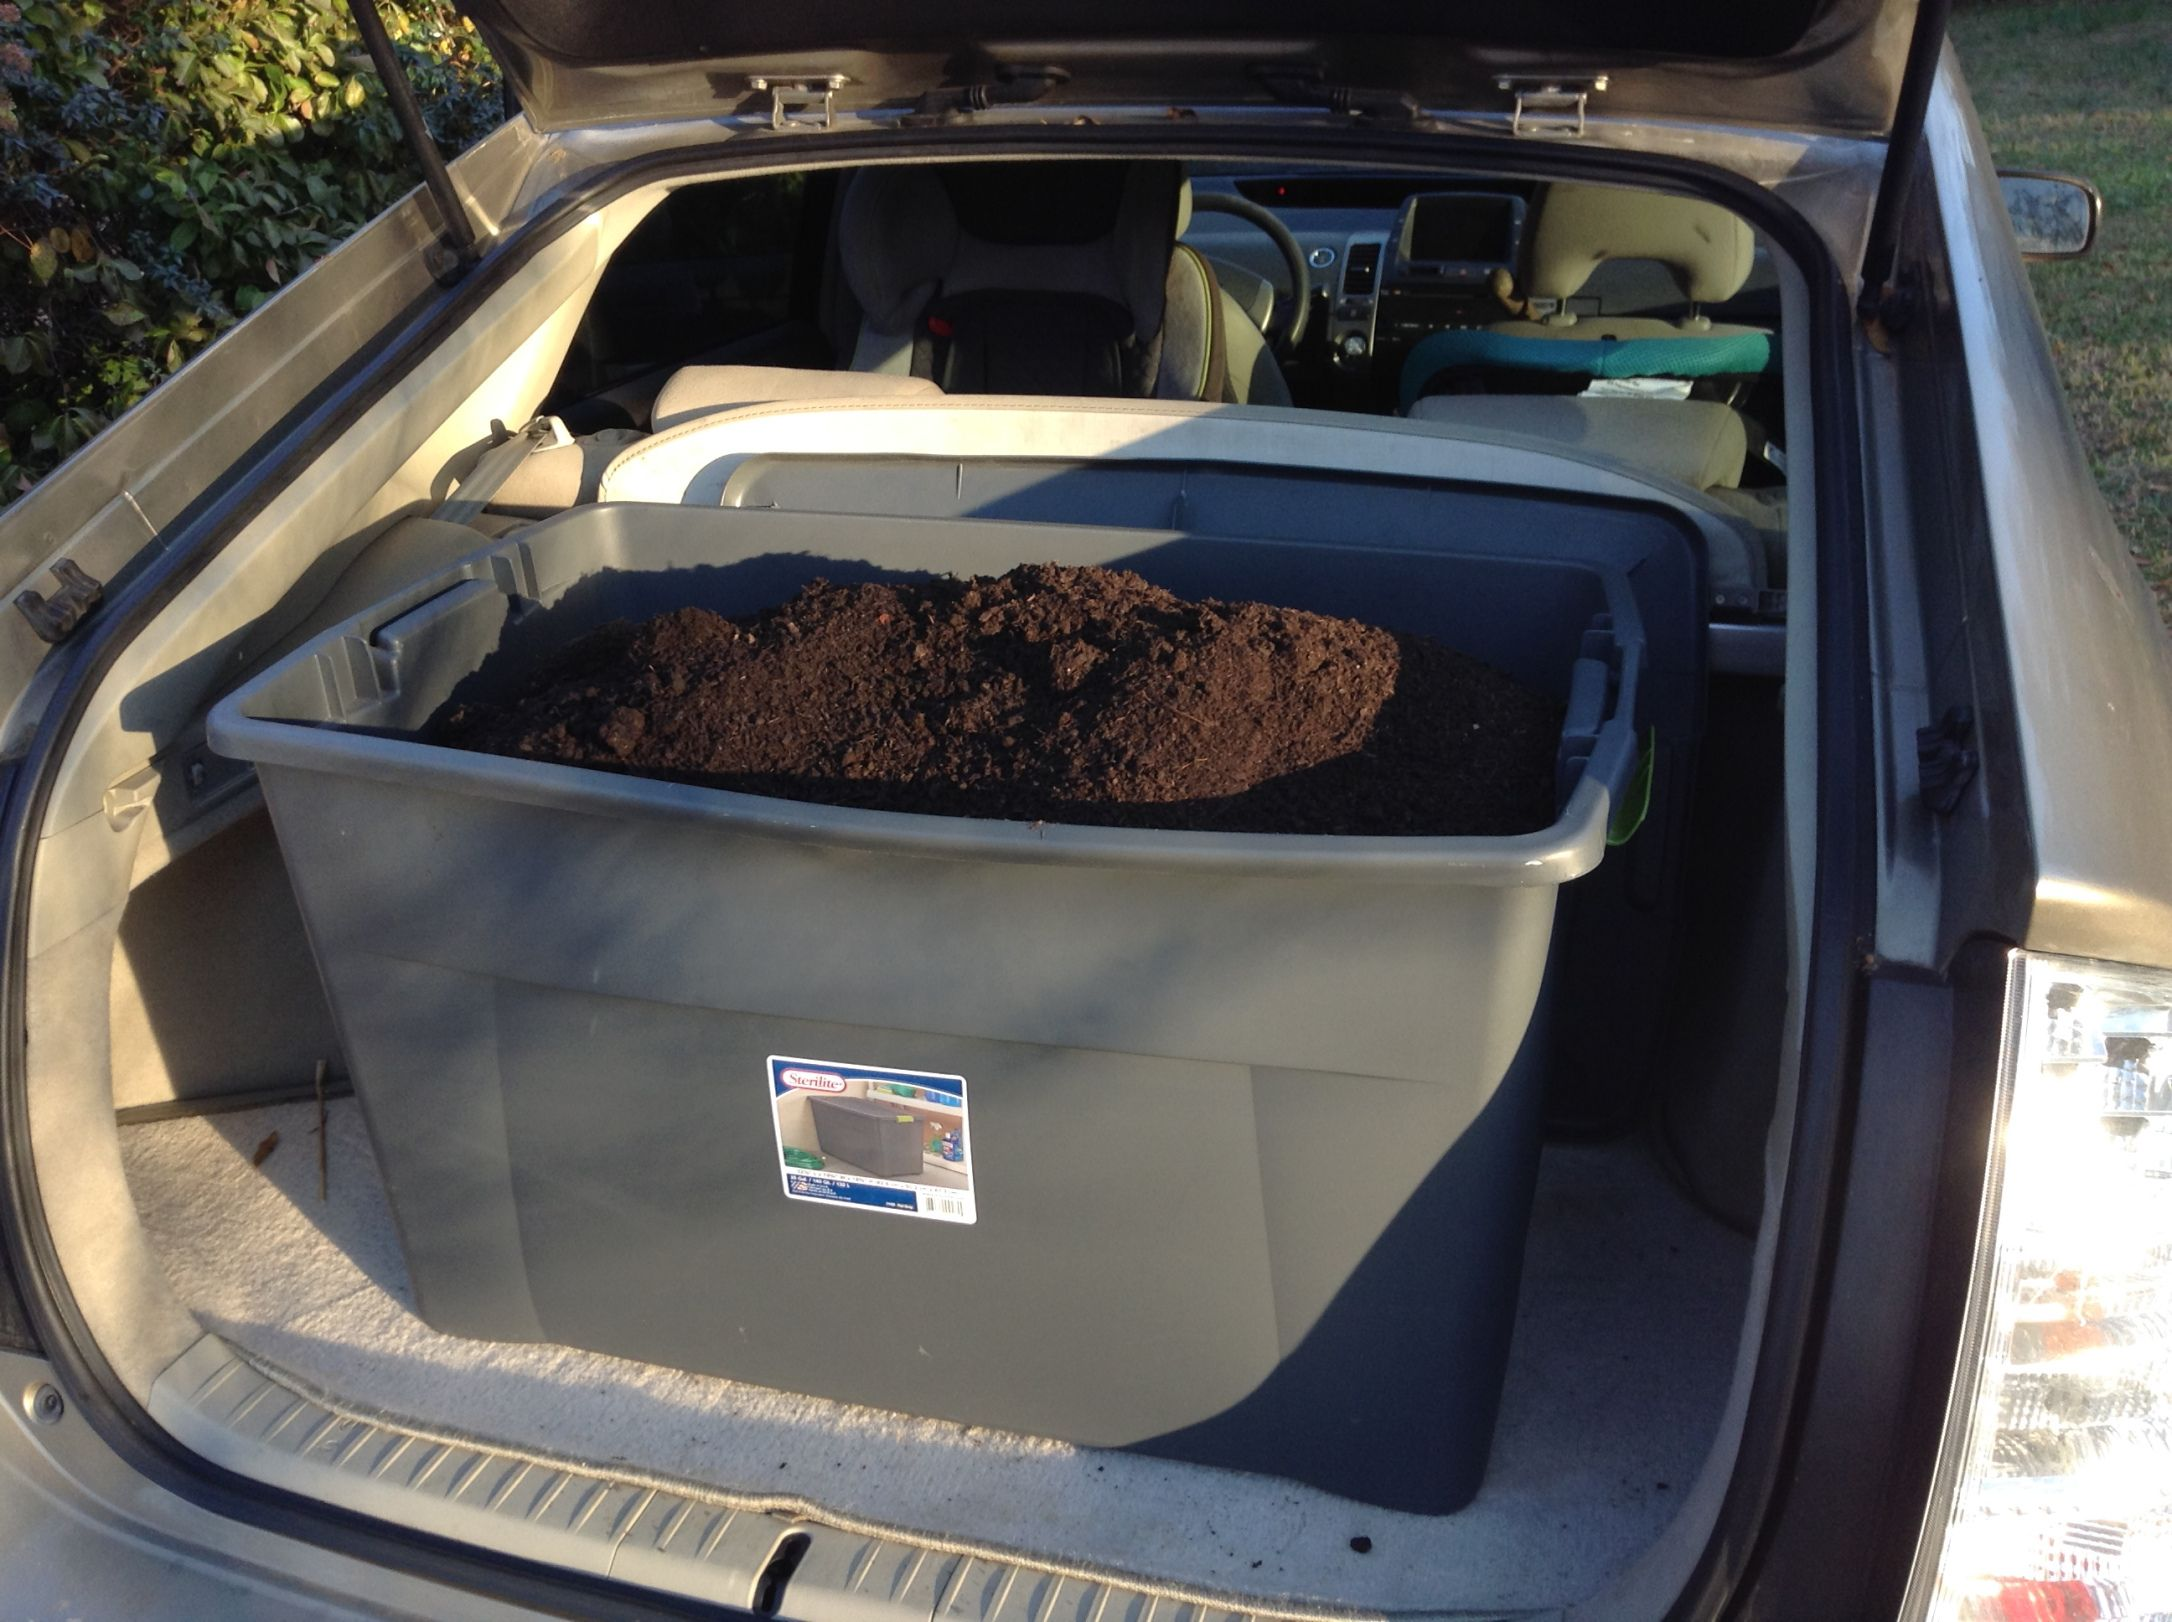 Garden soil zero waste in chattanooga garden soil